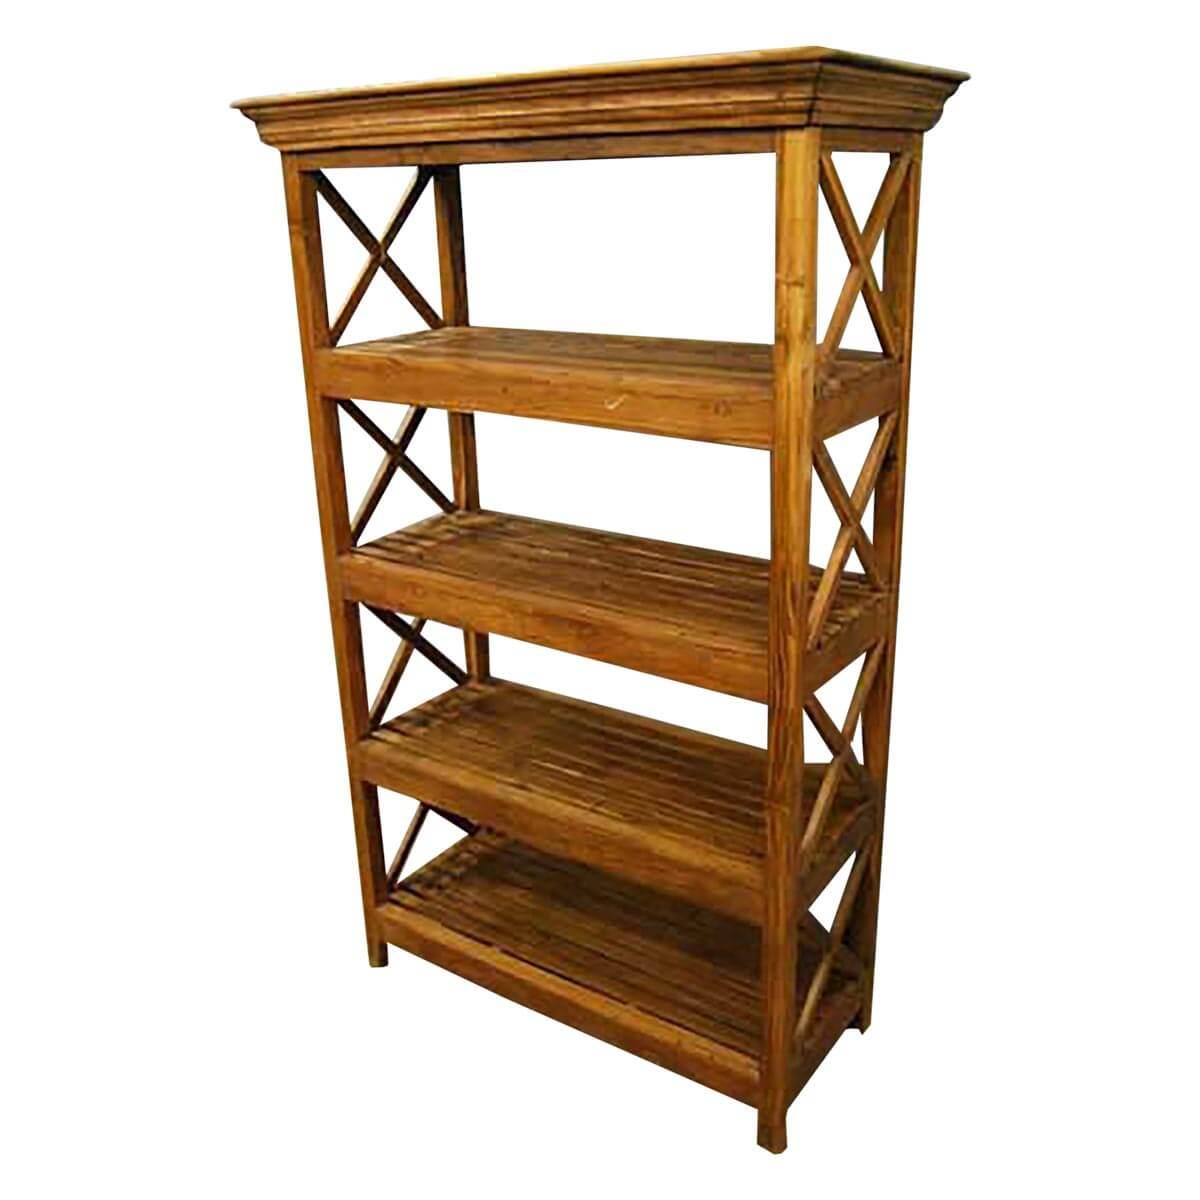 Novato 4 Open Shelf Rustic Solid Wood Bookcase